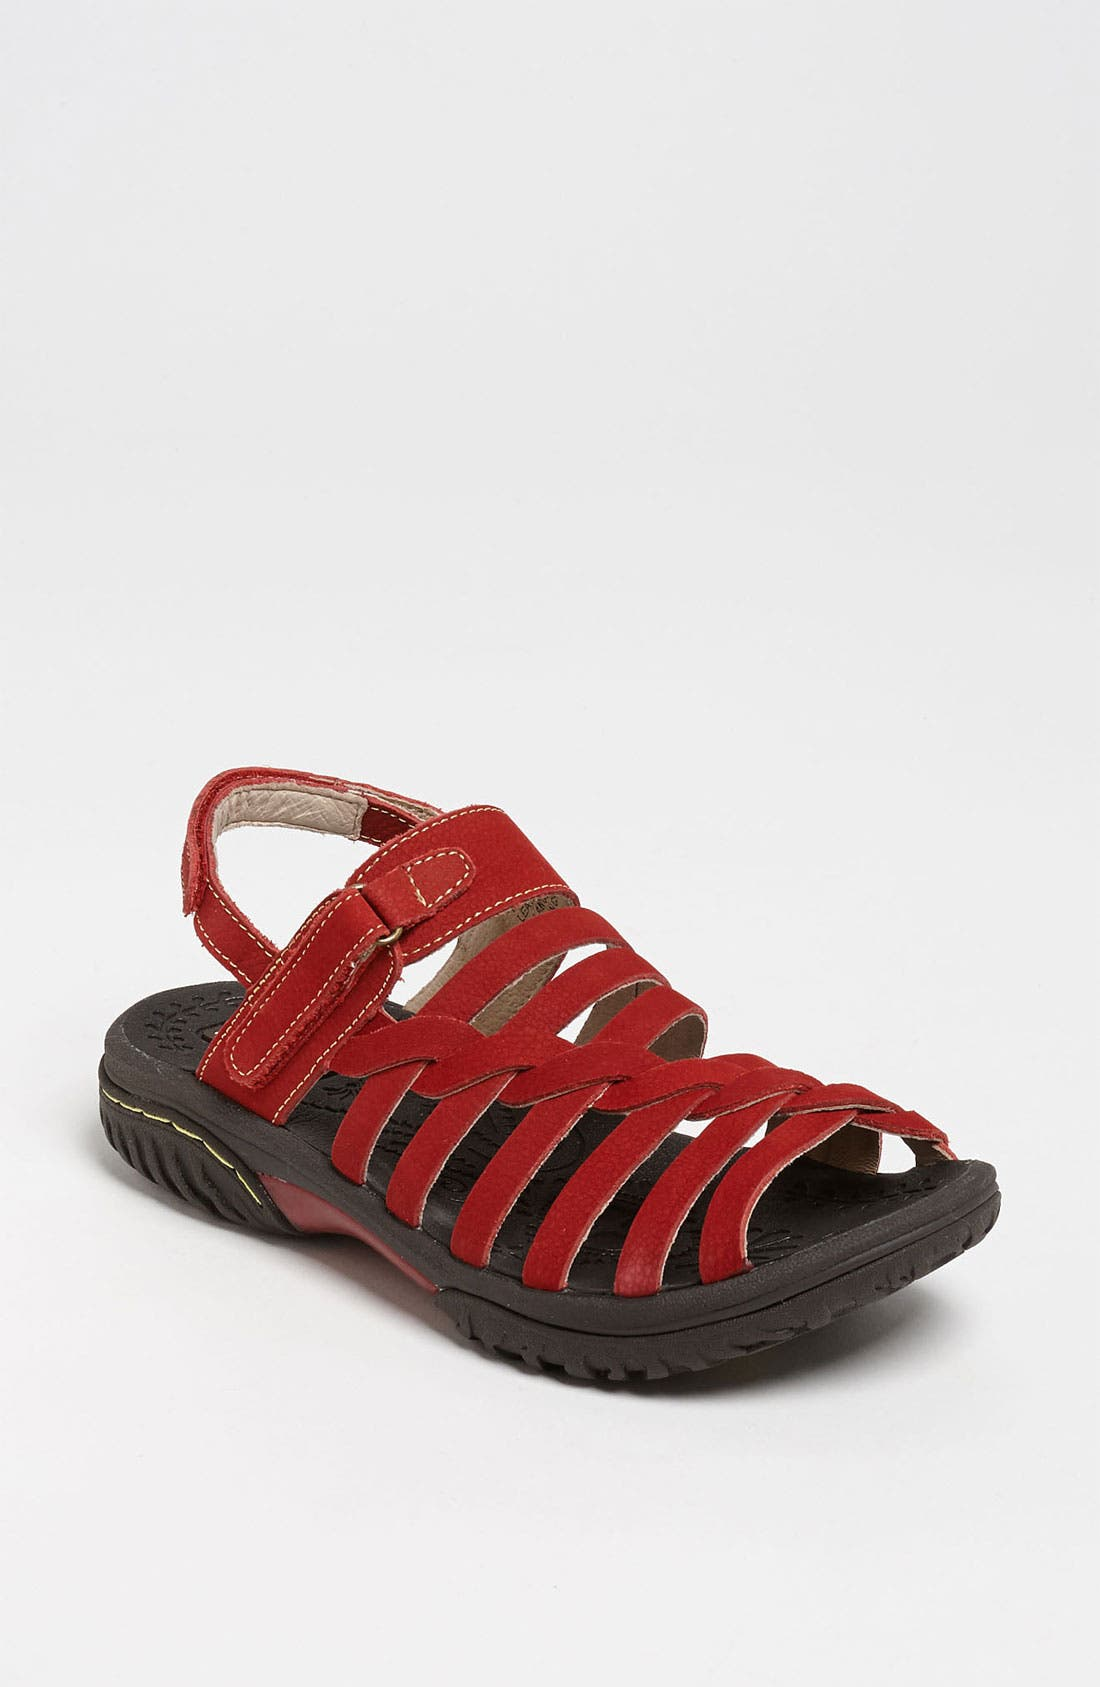 Main Image - Jambu 'Holly' Sandal